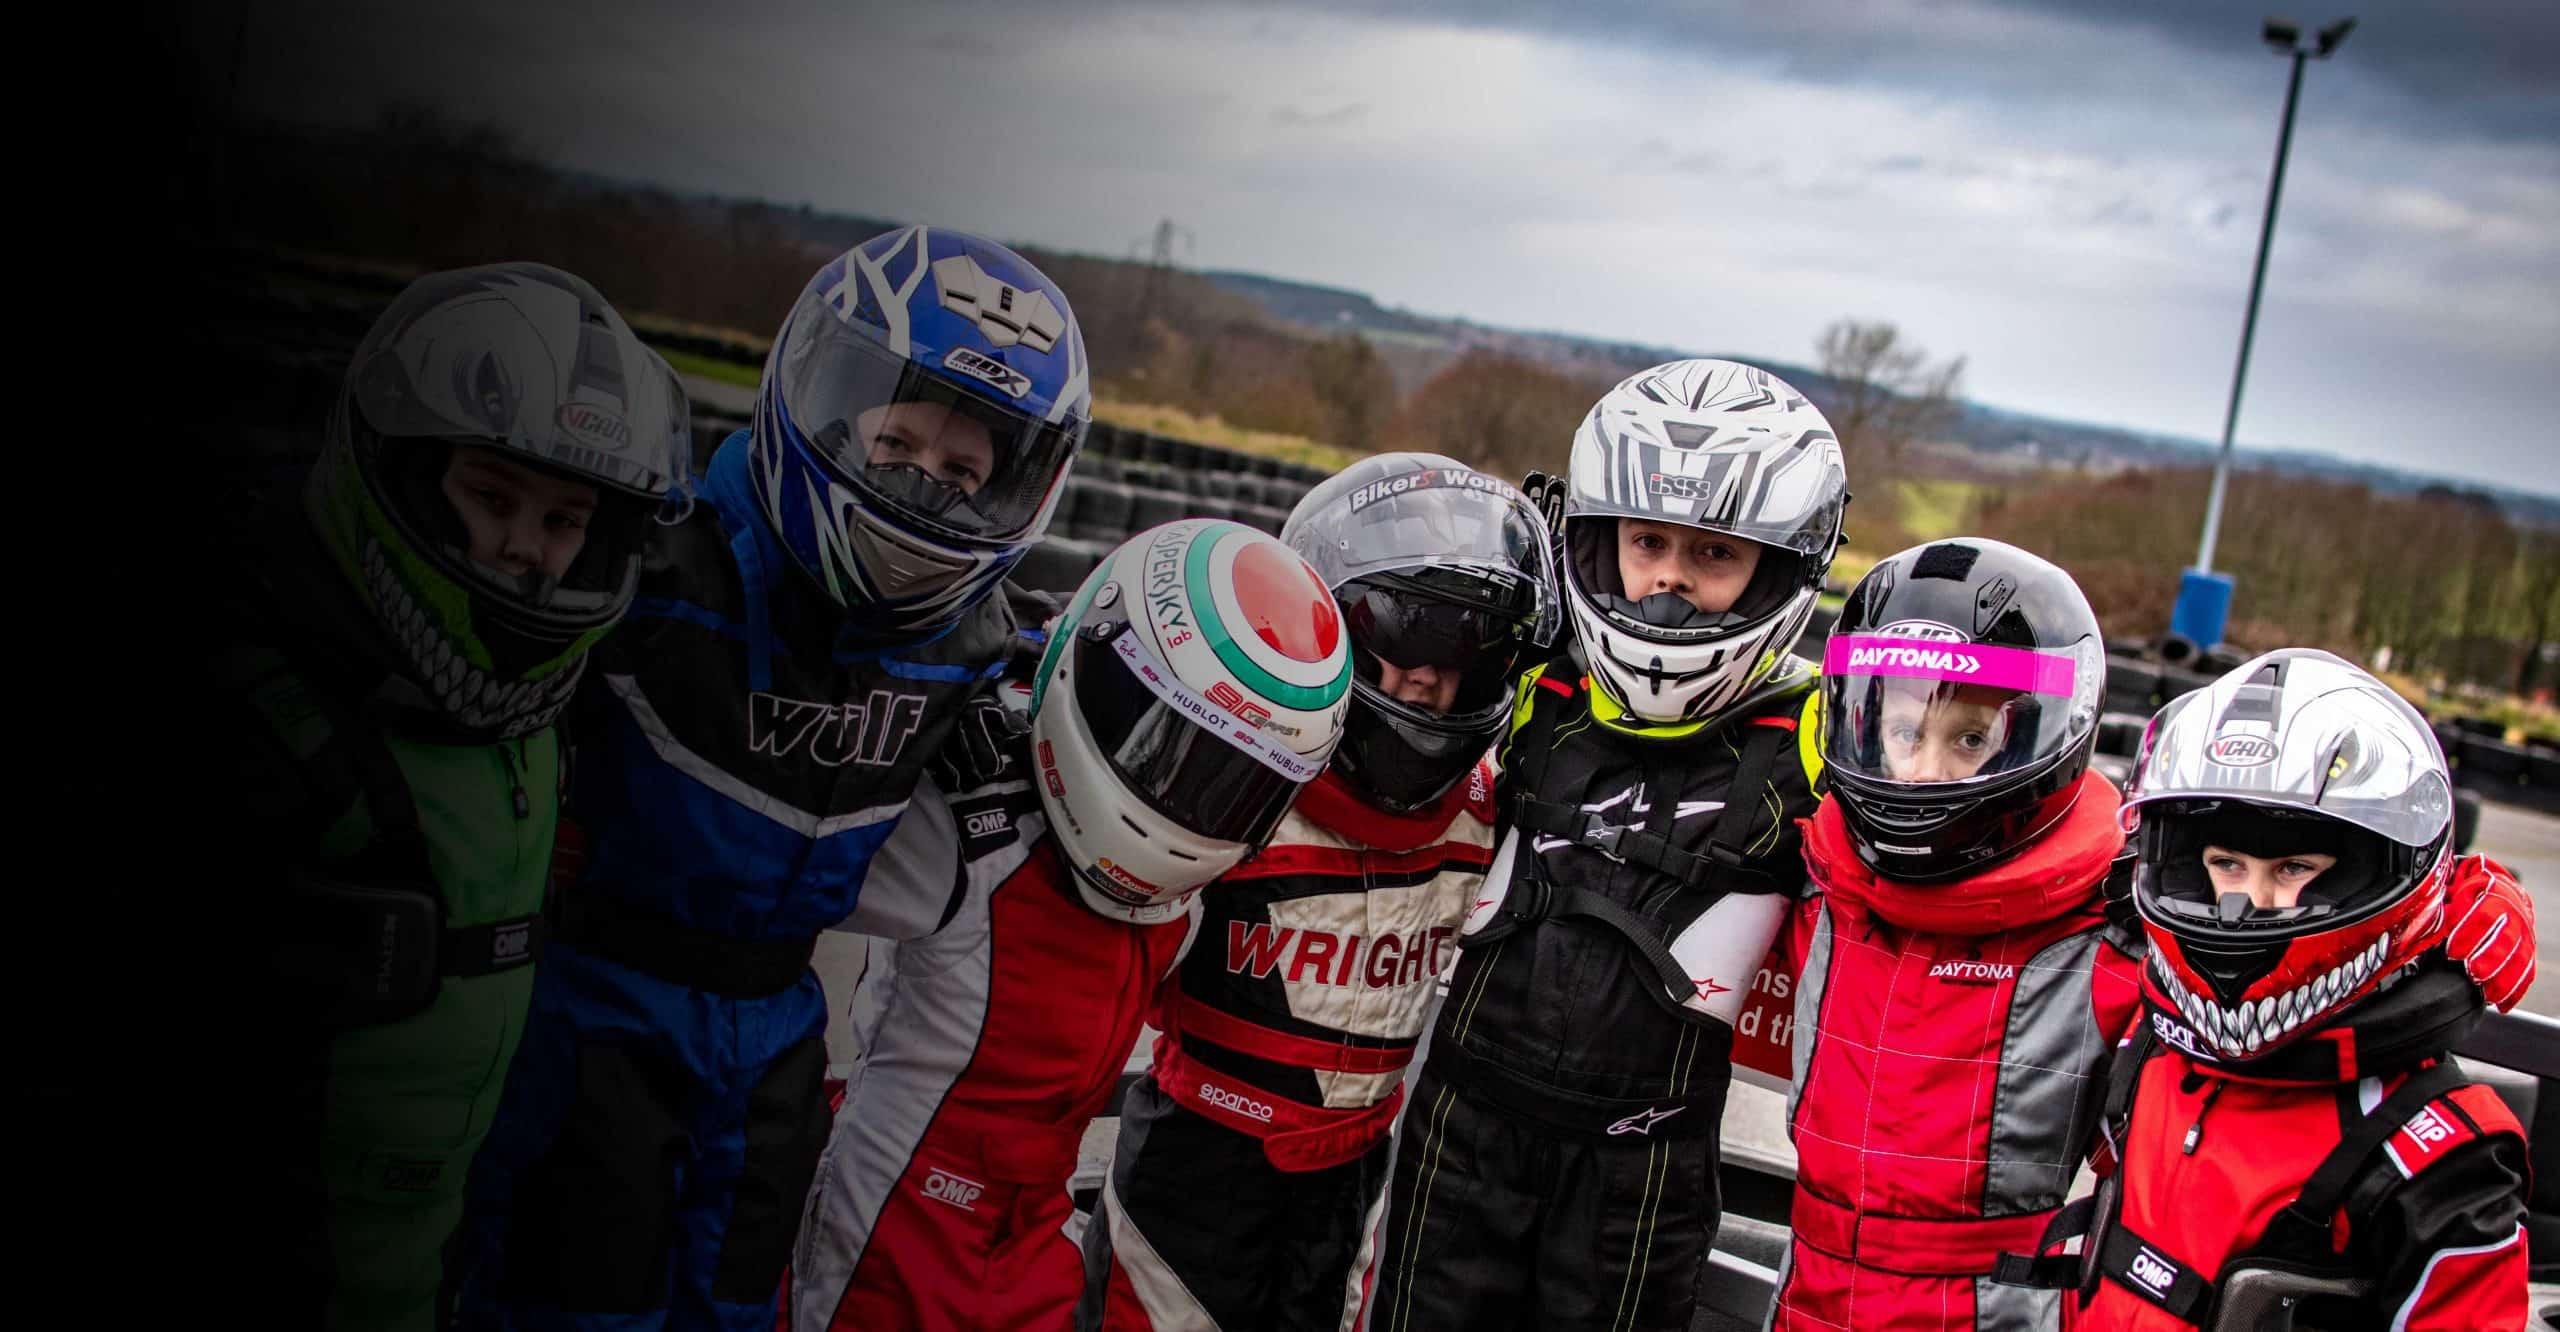 RACESCHOOL GO-KARTING TUITION